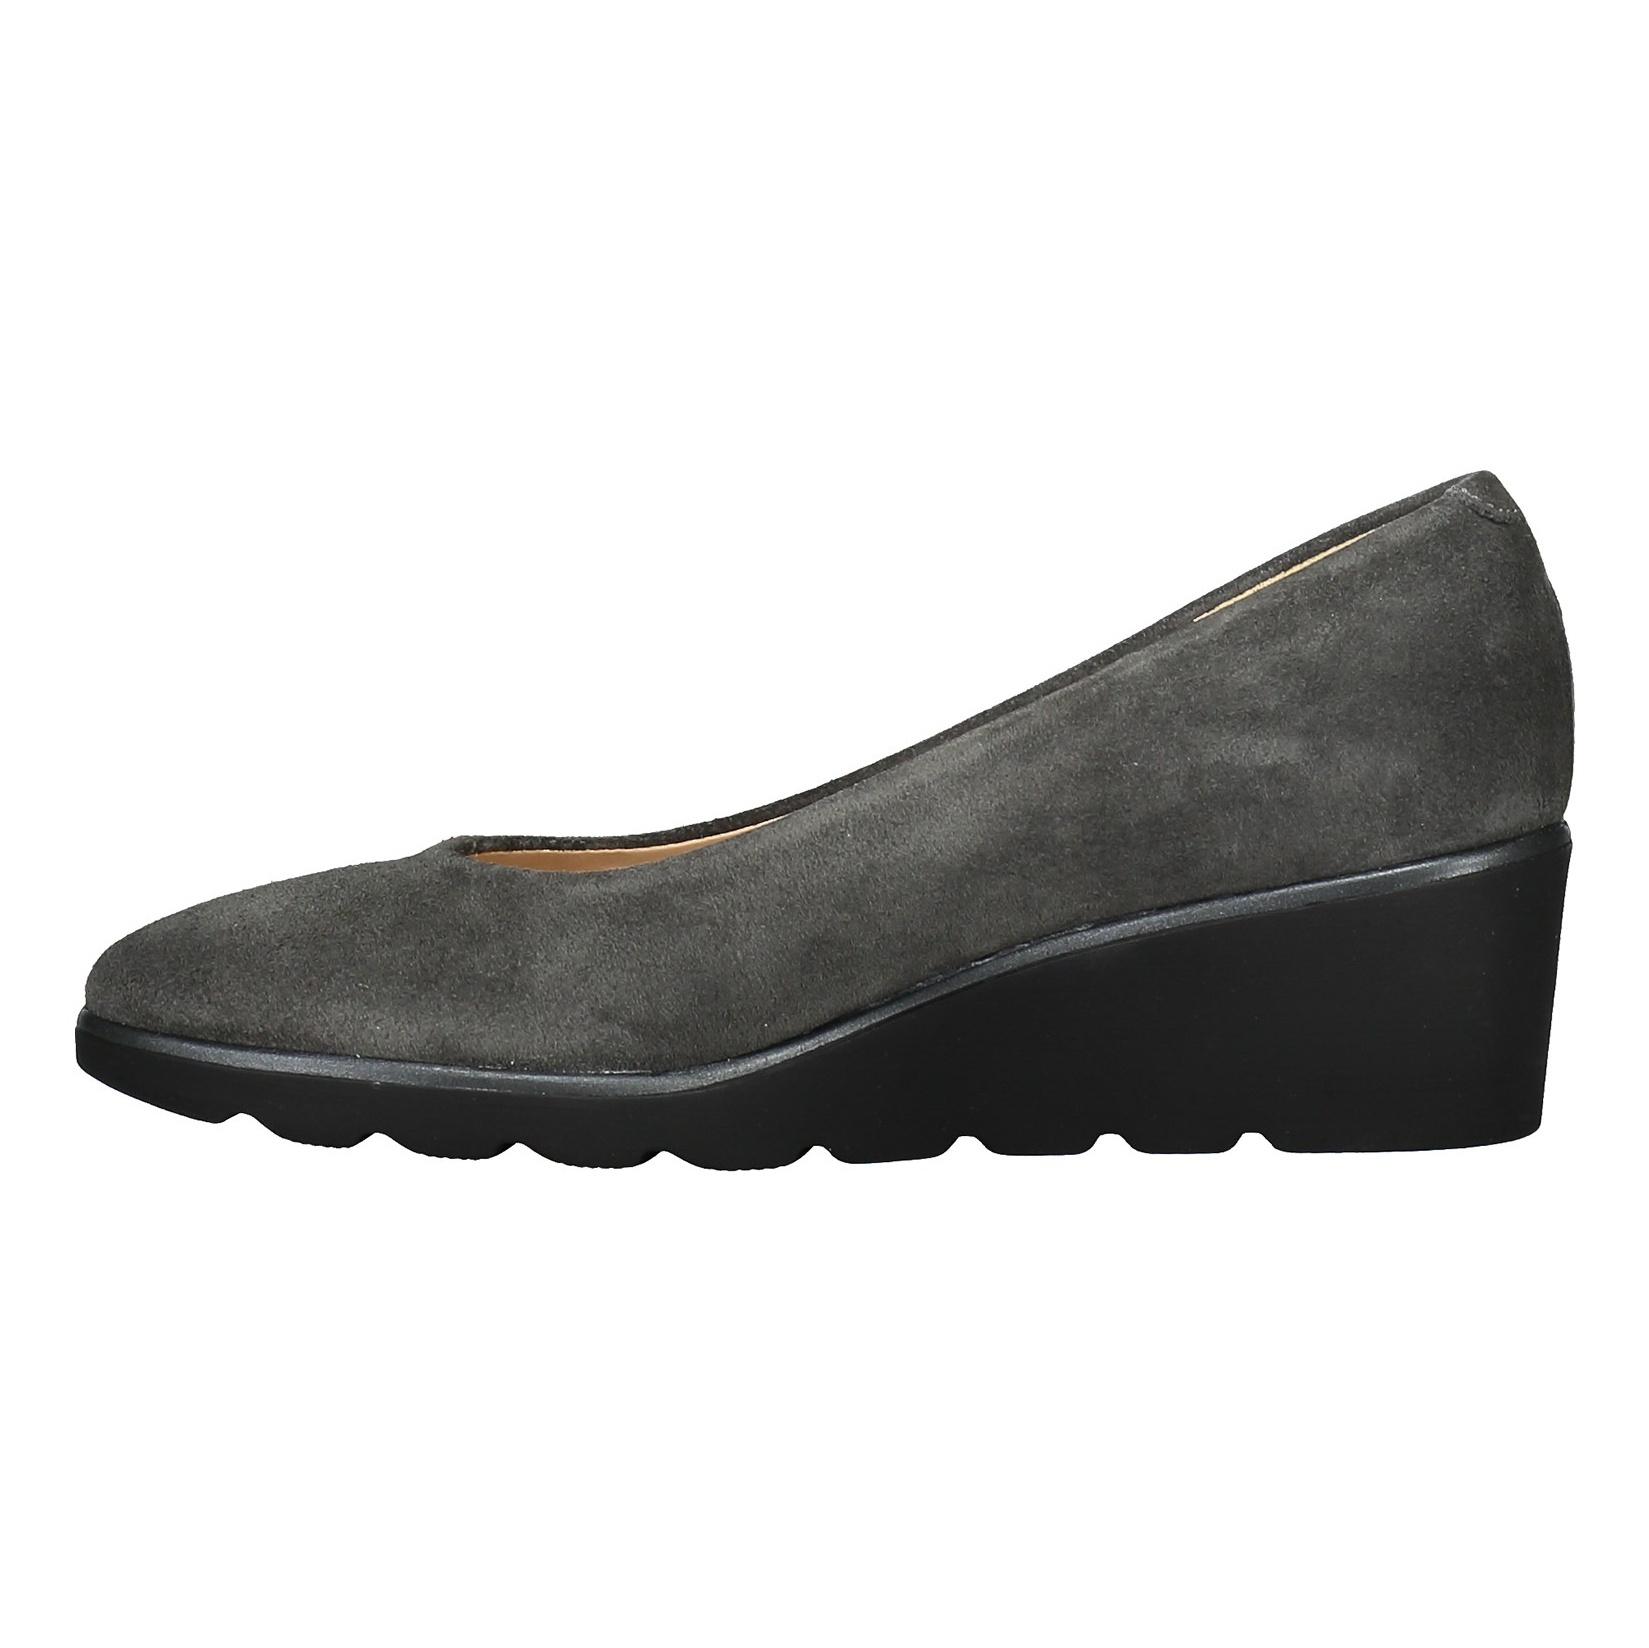 کفش جیر لژ دار چرم زنانه - پونت روما - طوسي - 3